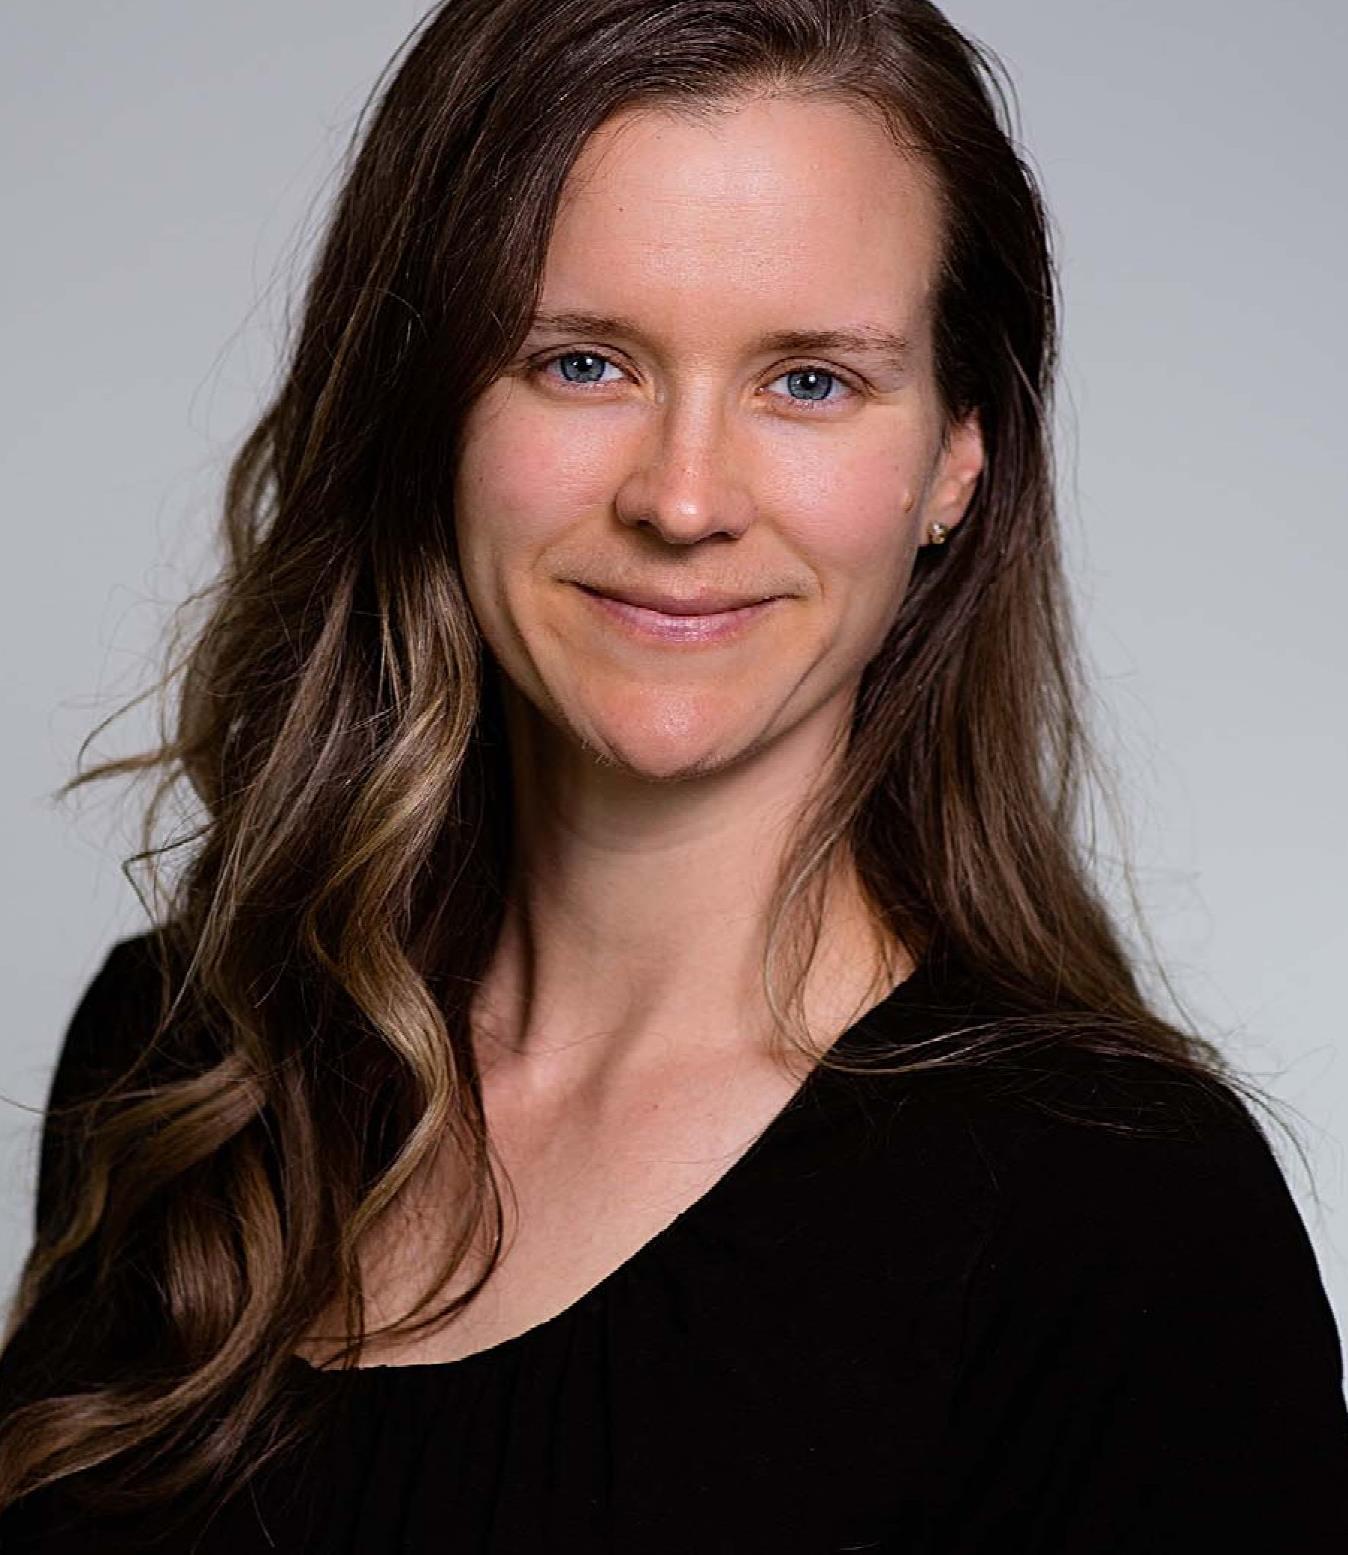 MeredithMeredith